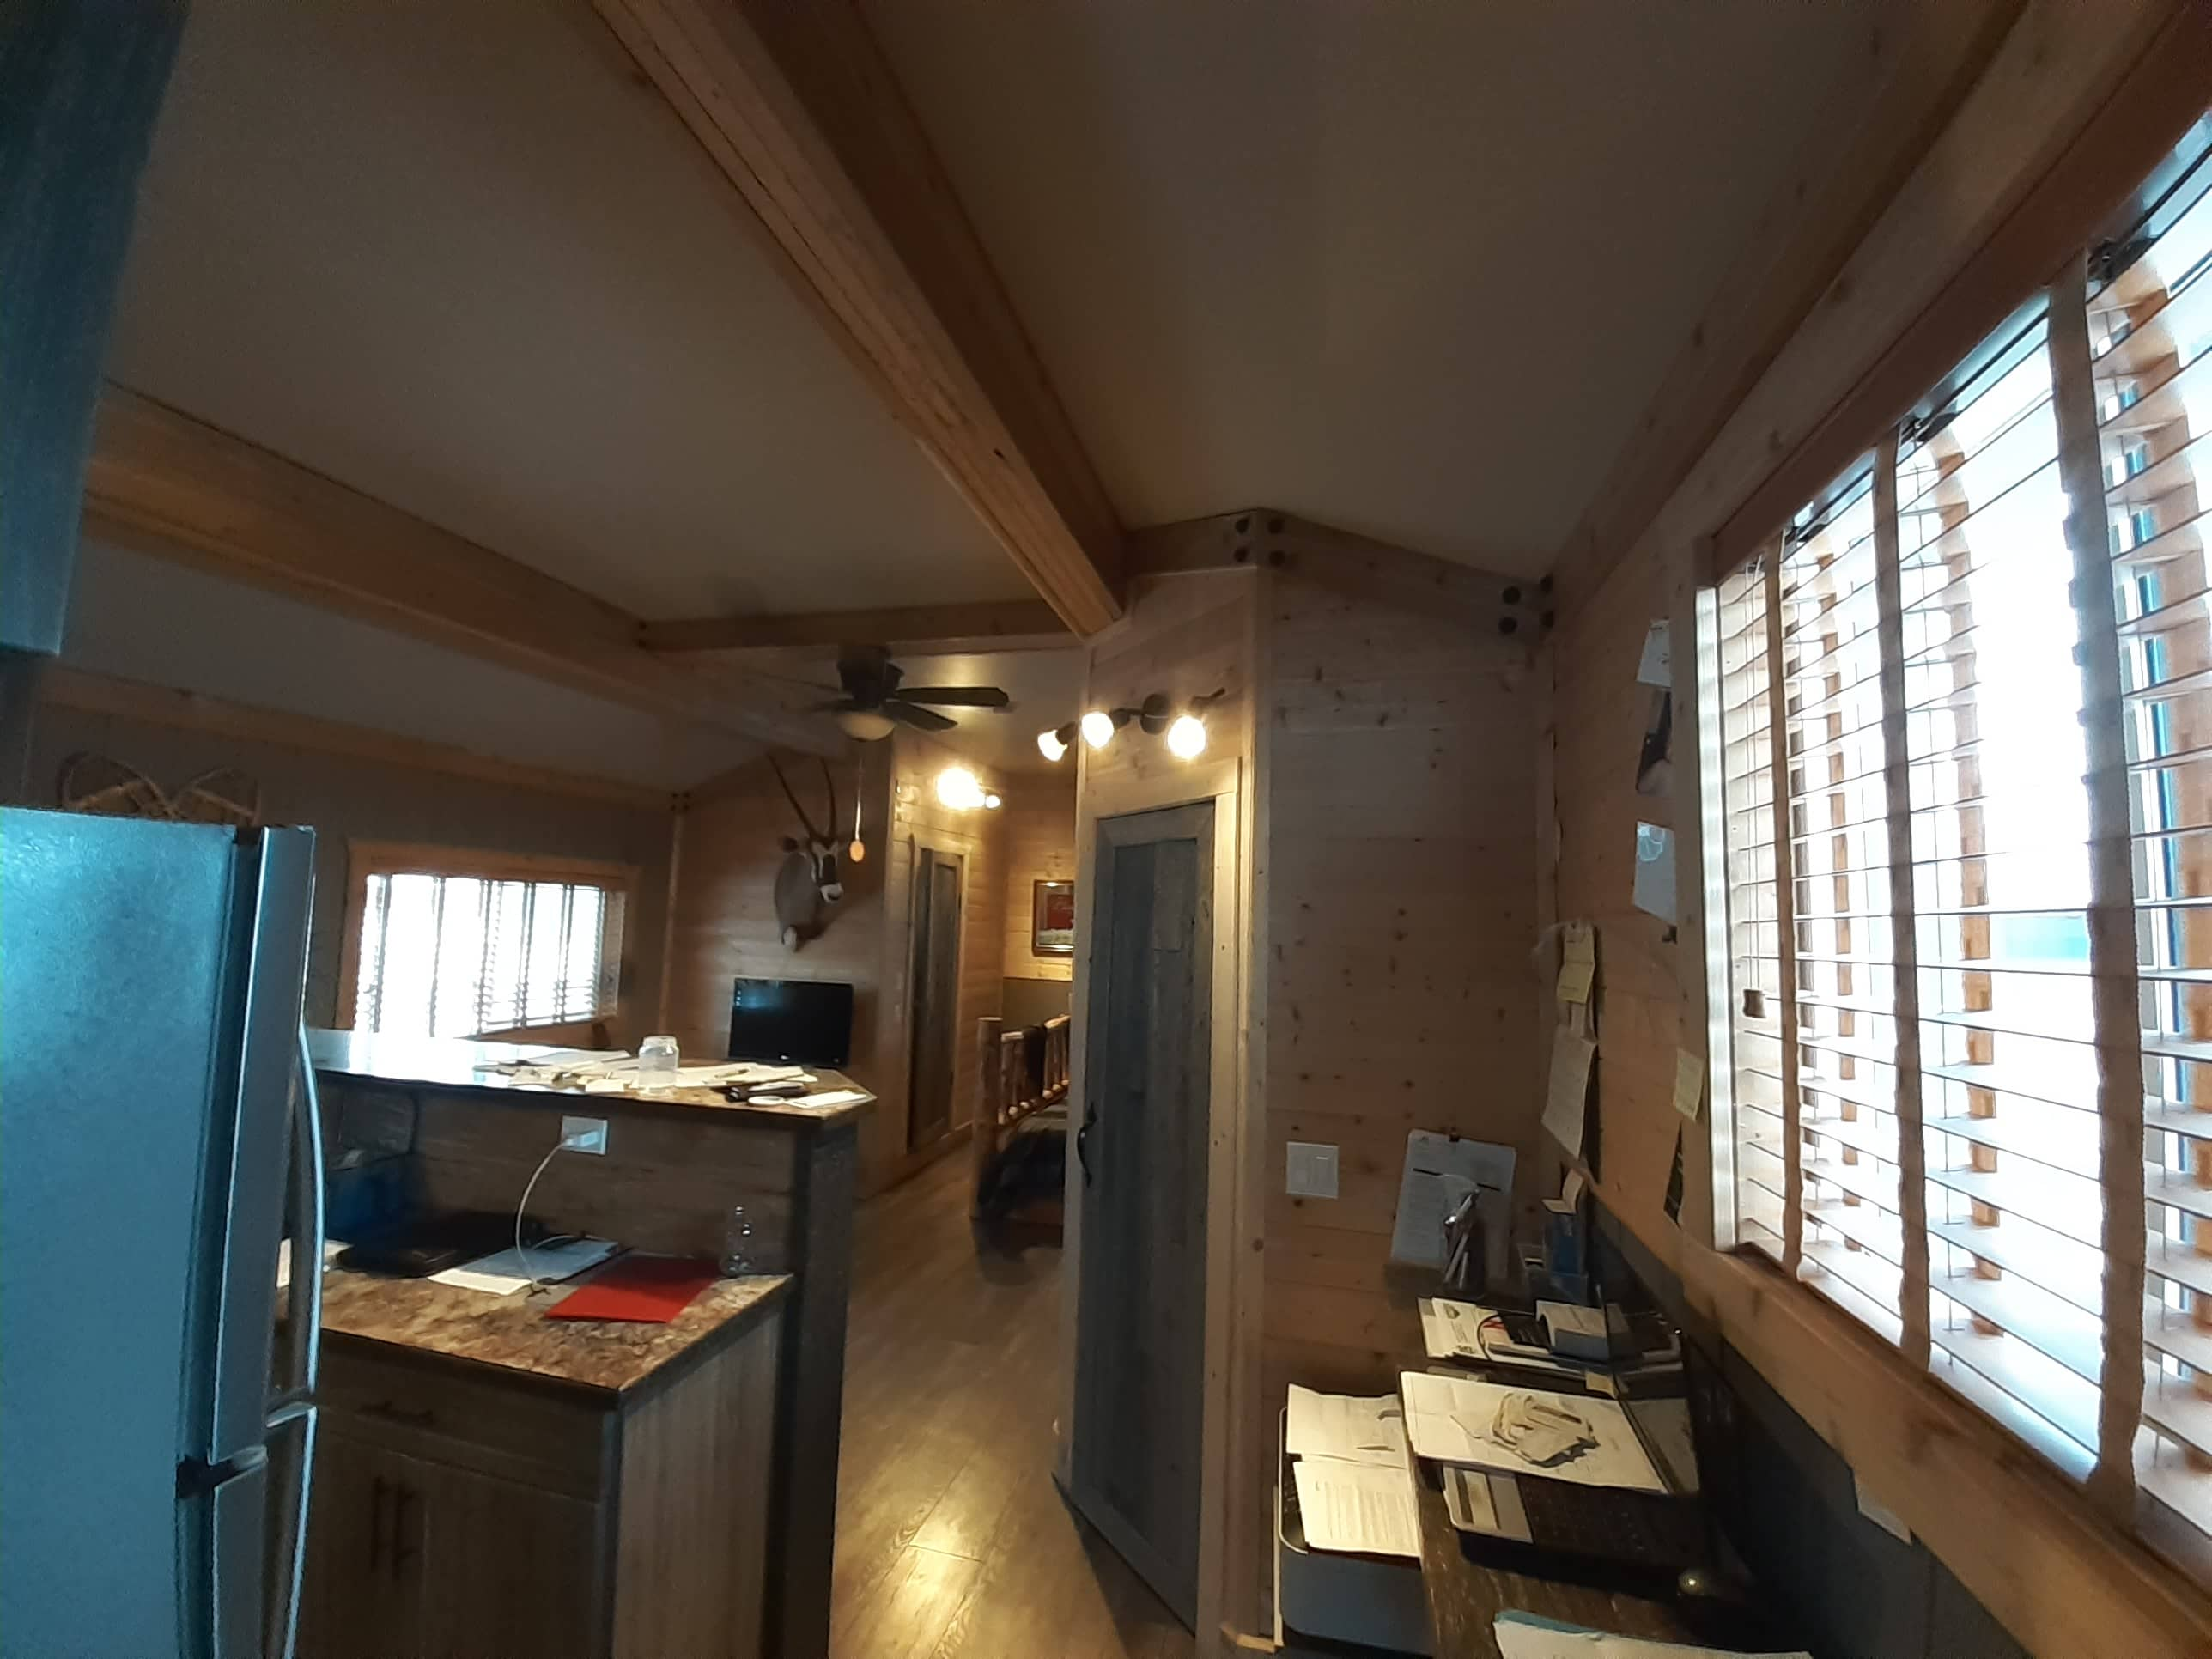 cabins-01